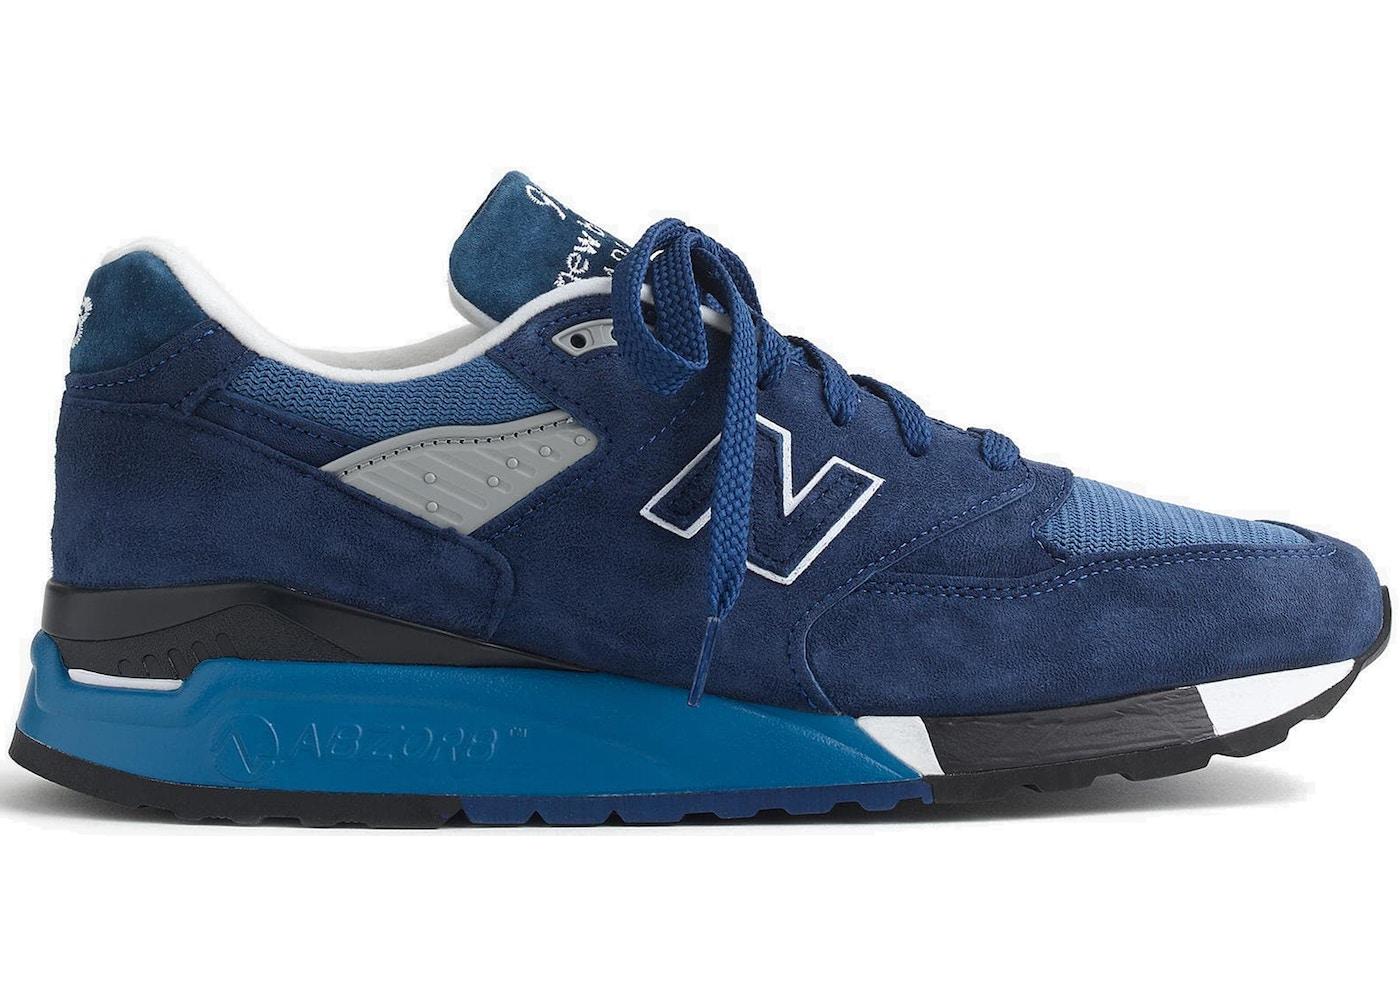 san francisco 434c2 5bd05 New Balance 998 J. Crew Crater Lake - Sneakers